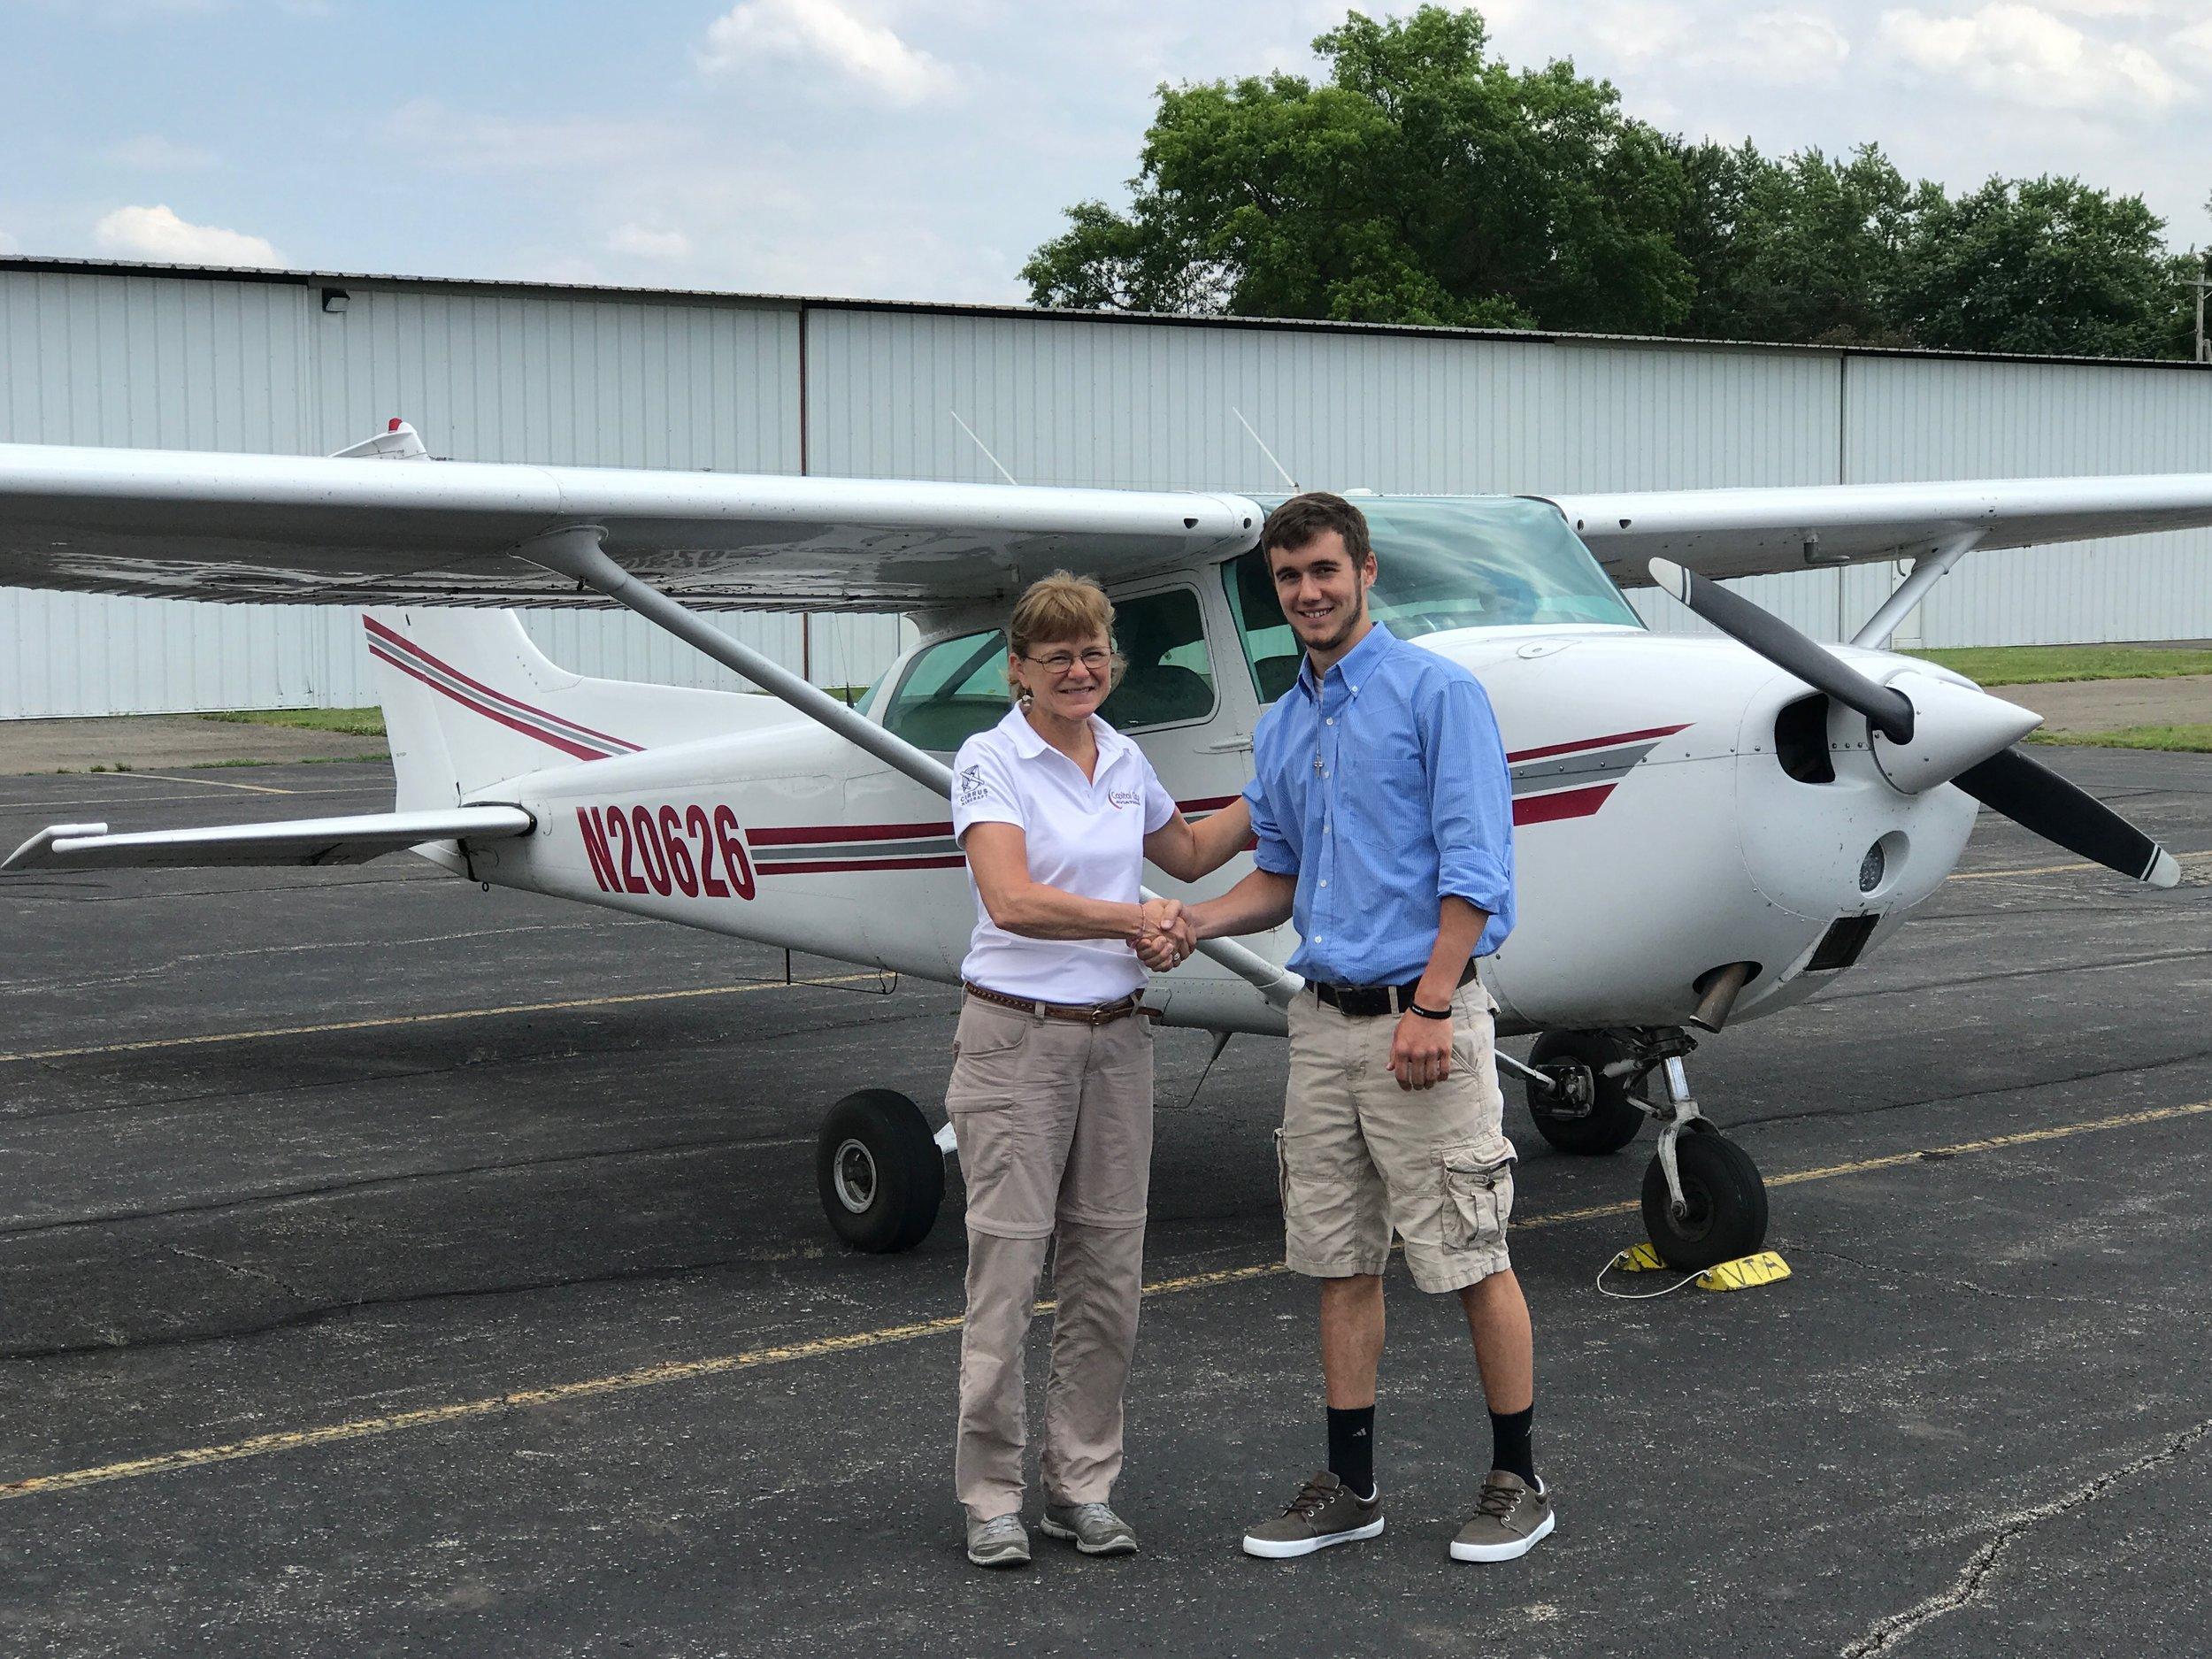 Congratulations-first Private Pilot PASS serving as Designated Pilot Examiner